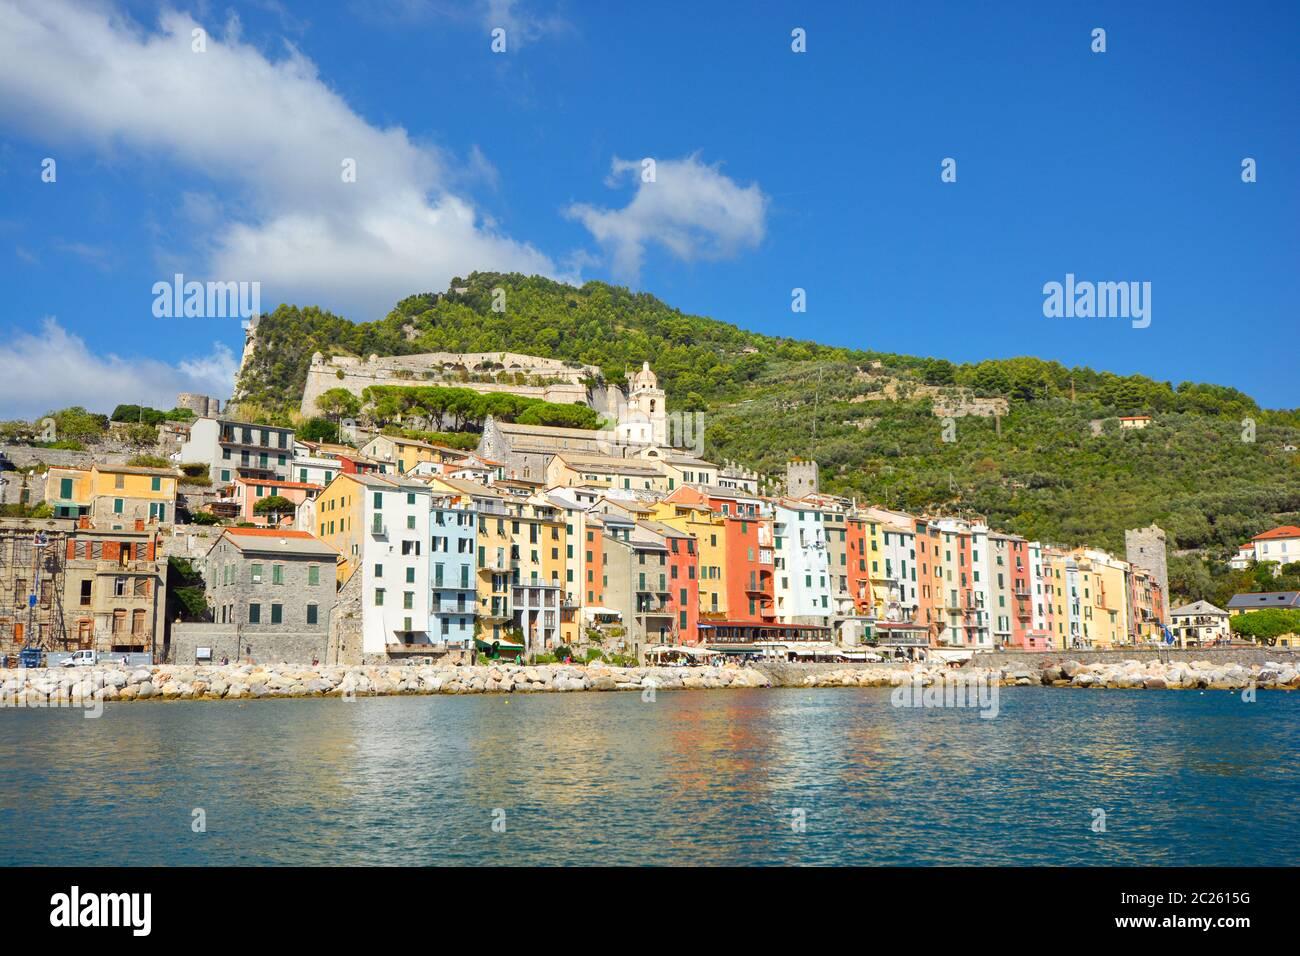 The colorful coastal village of Porto Venere, Italy, on the Ligurian coast, with it's sidewalk cafes, shops and marina. Stock Photo